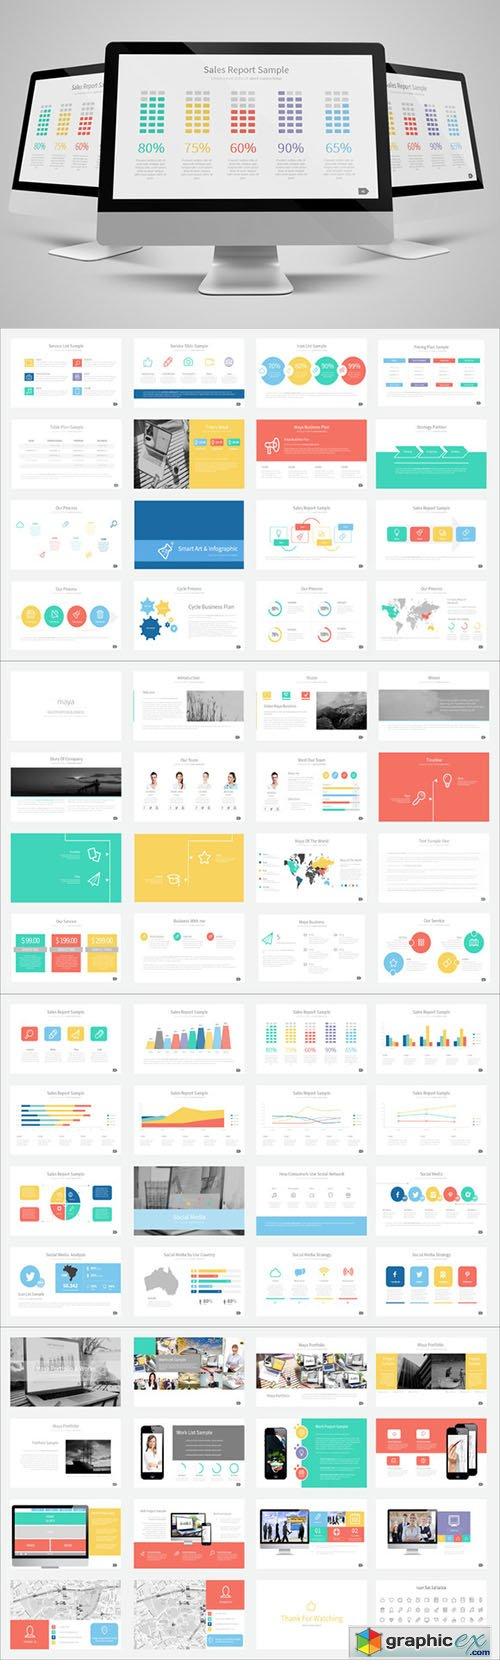 maya presentation template » free download vector stock image, Presentation templates